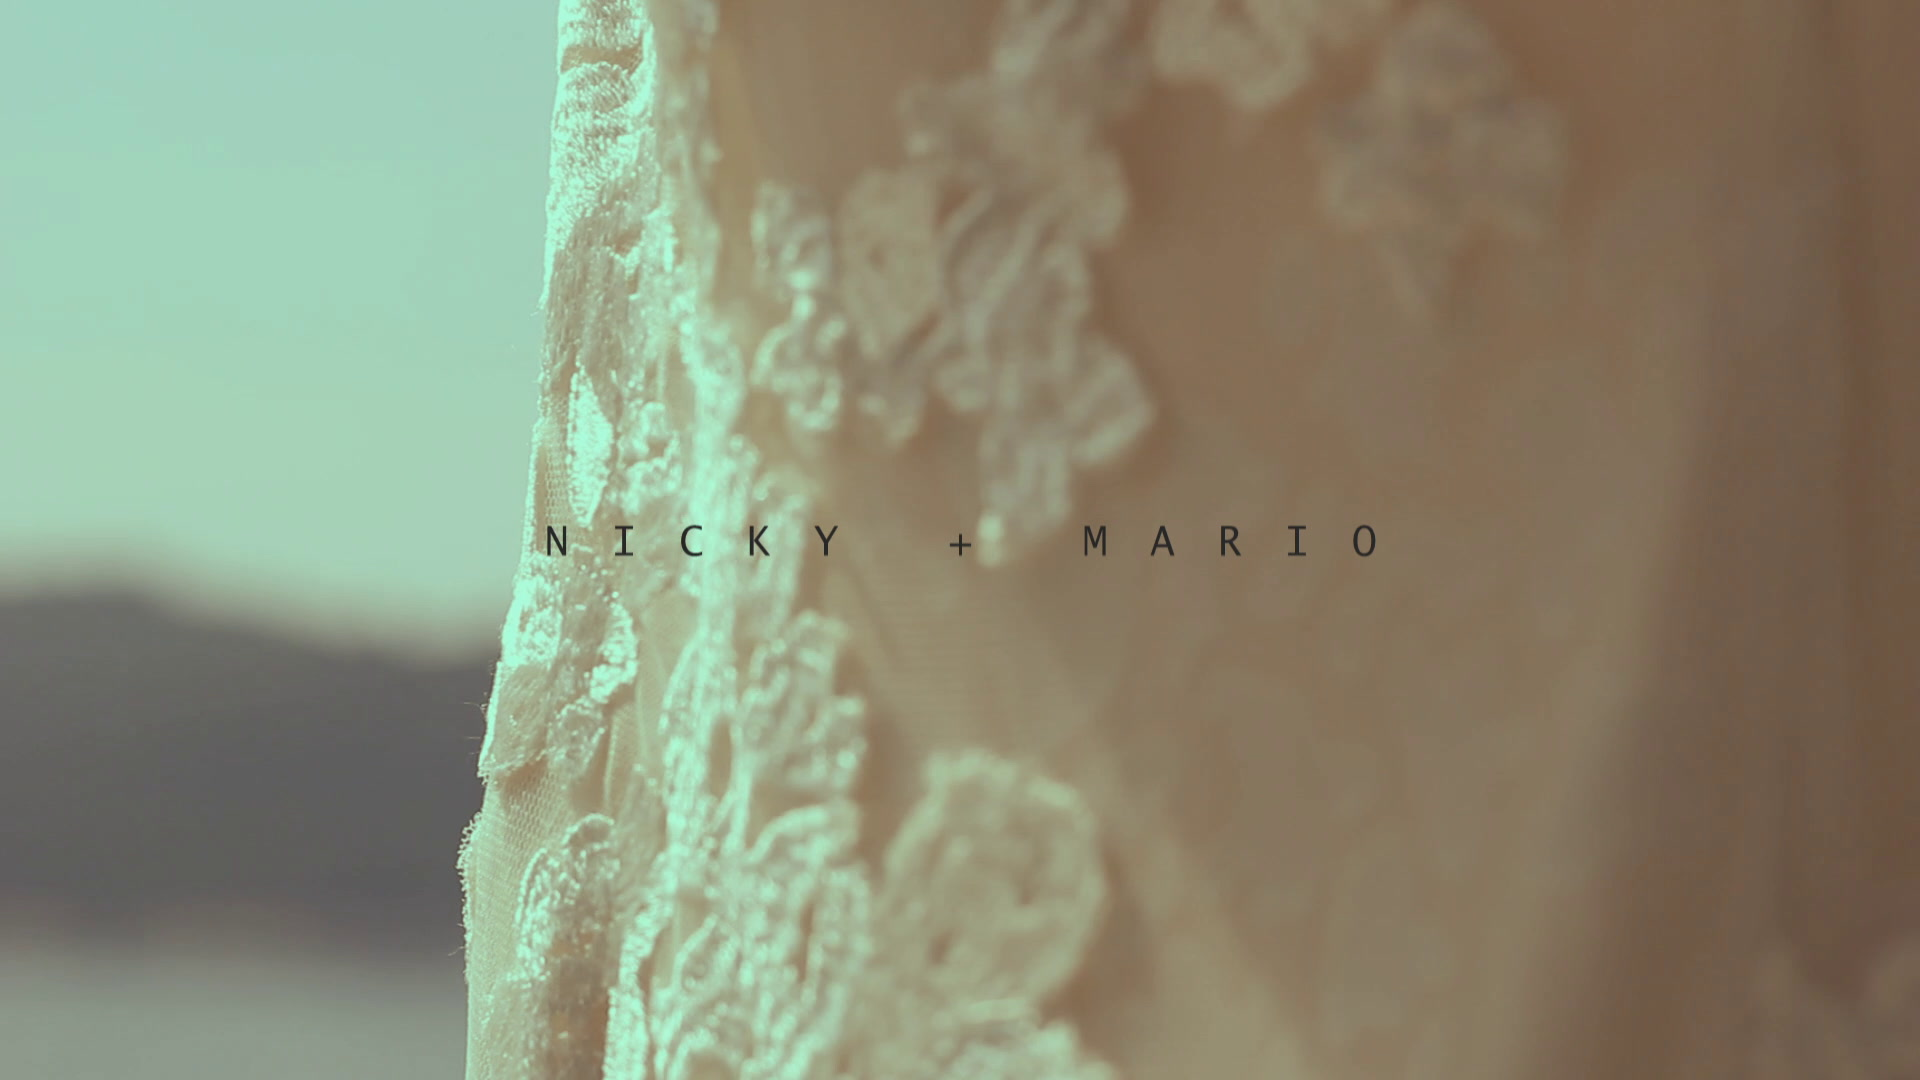 Nicky + Mario | Dubrovnik, Croatia | Excelsior